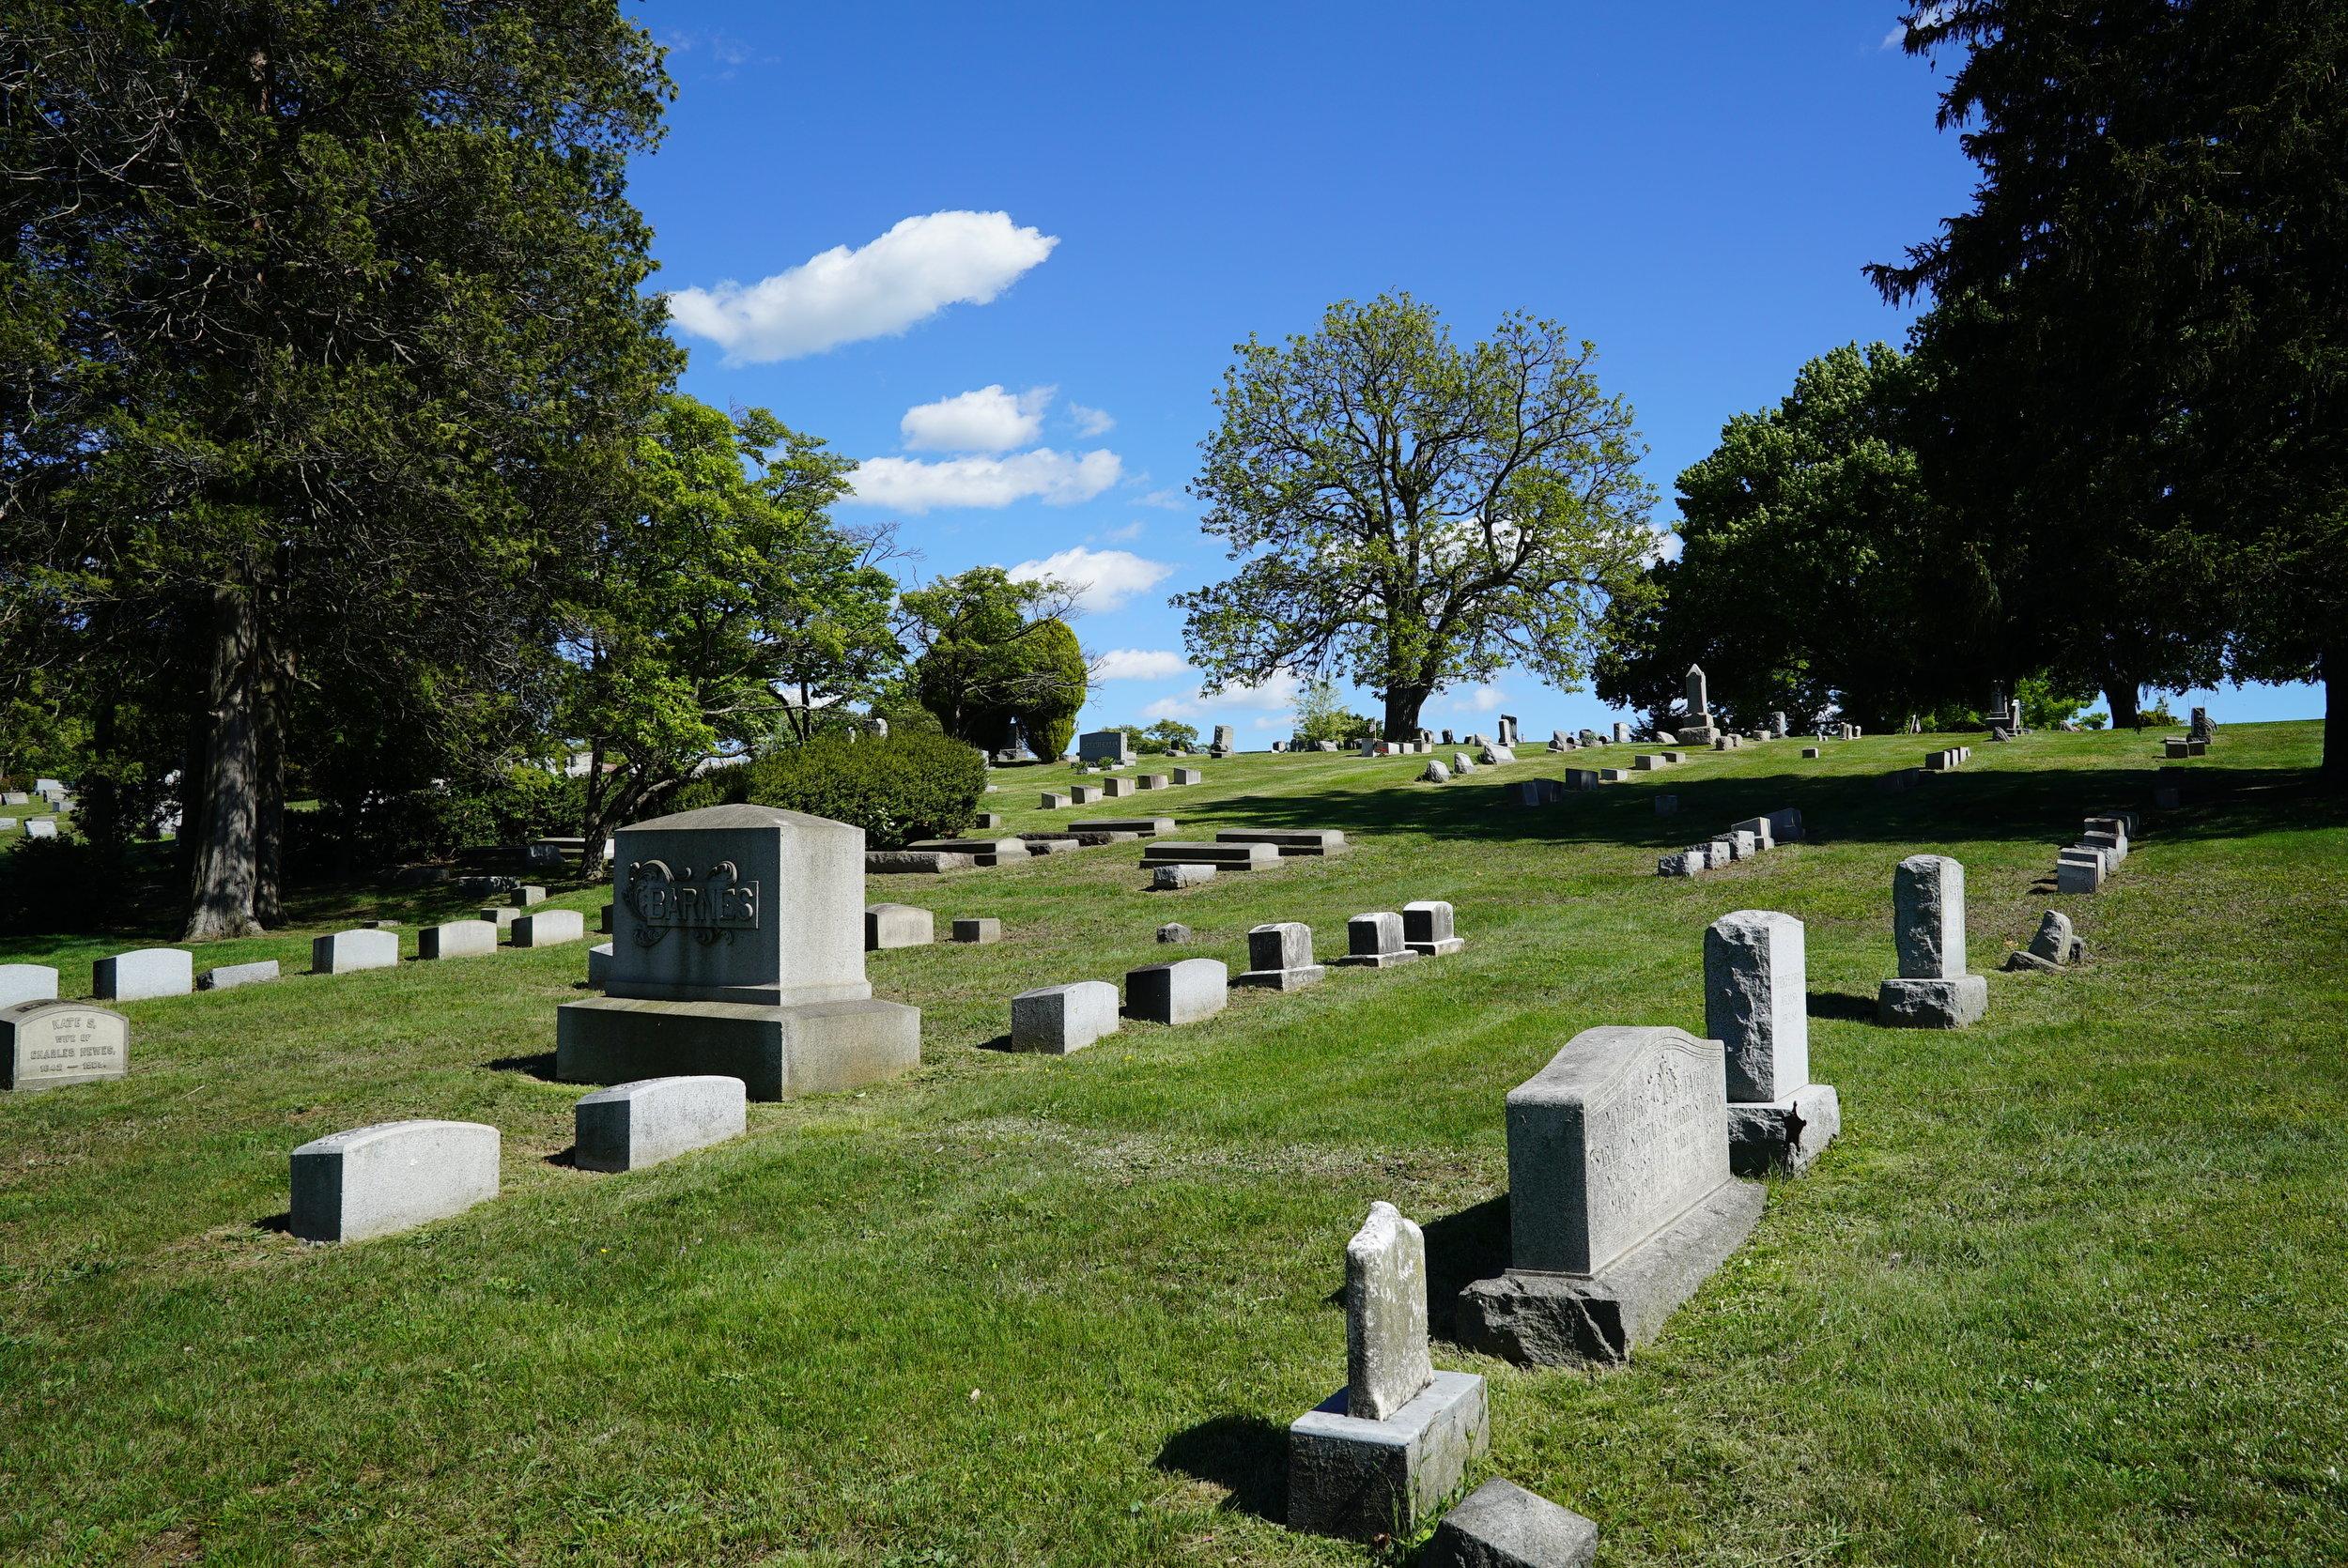 One of the vistas at Fairview Cemetery. Coatesville, Pennsylvania.